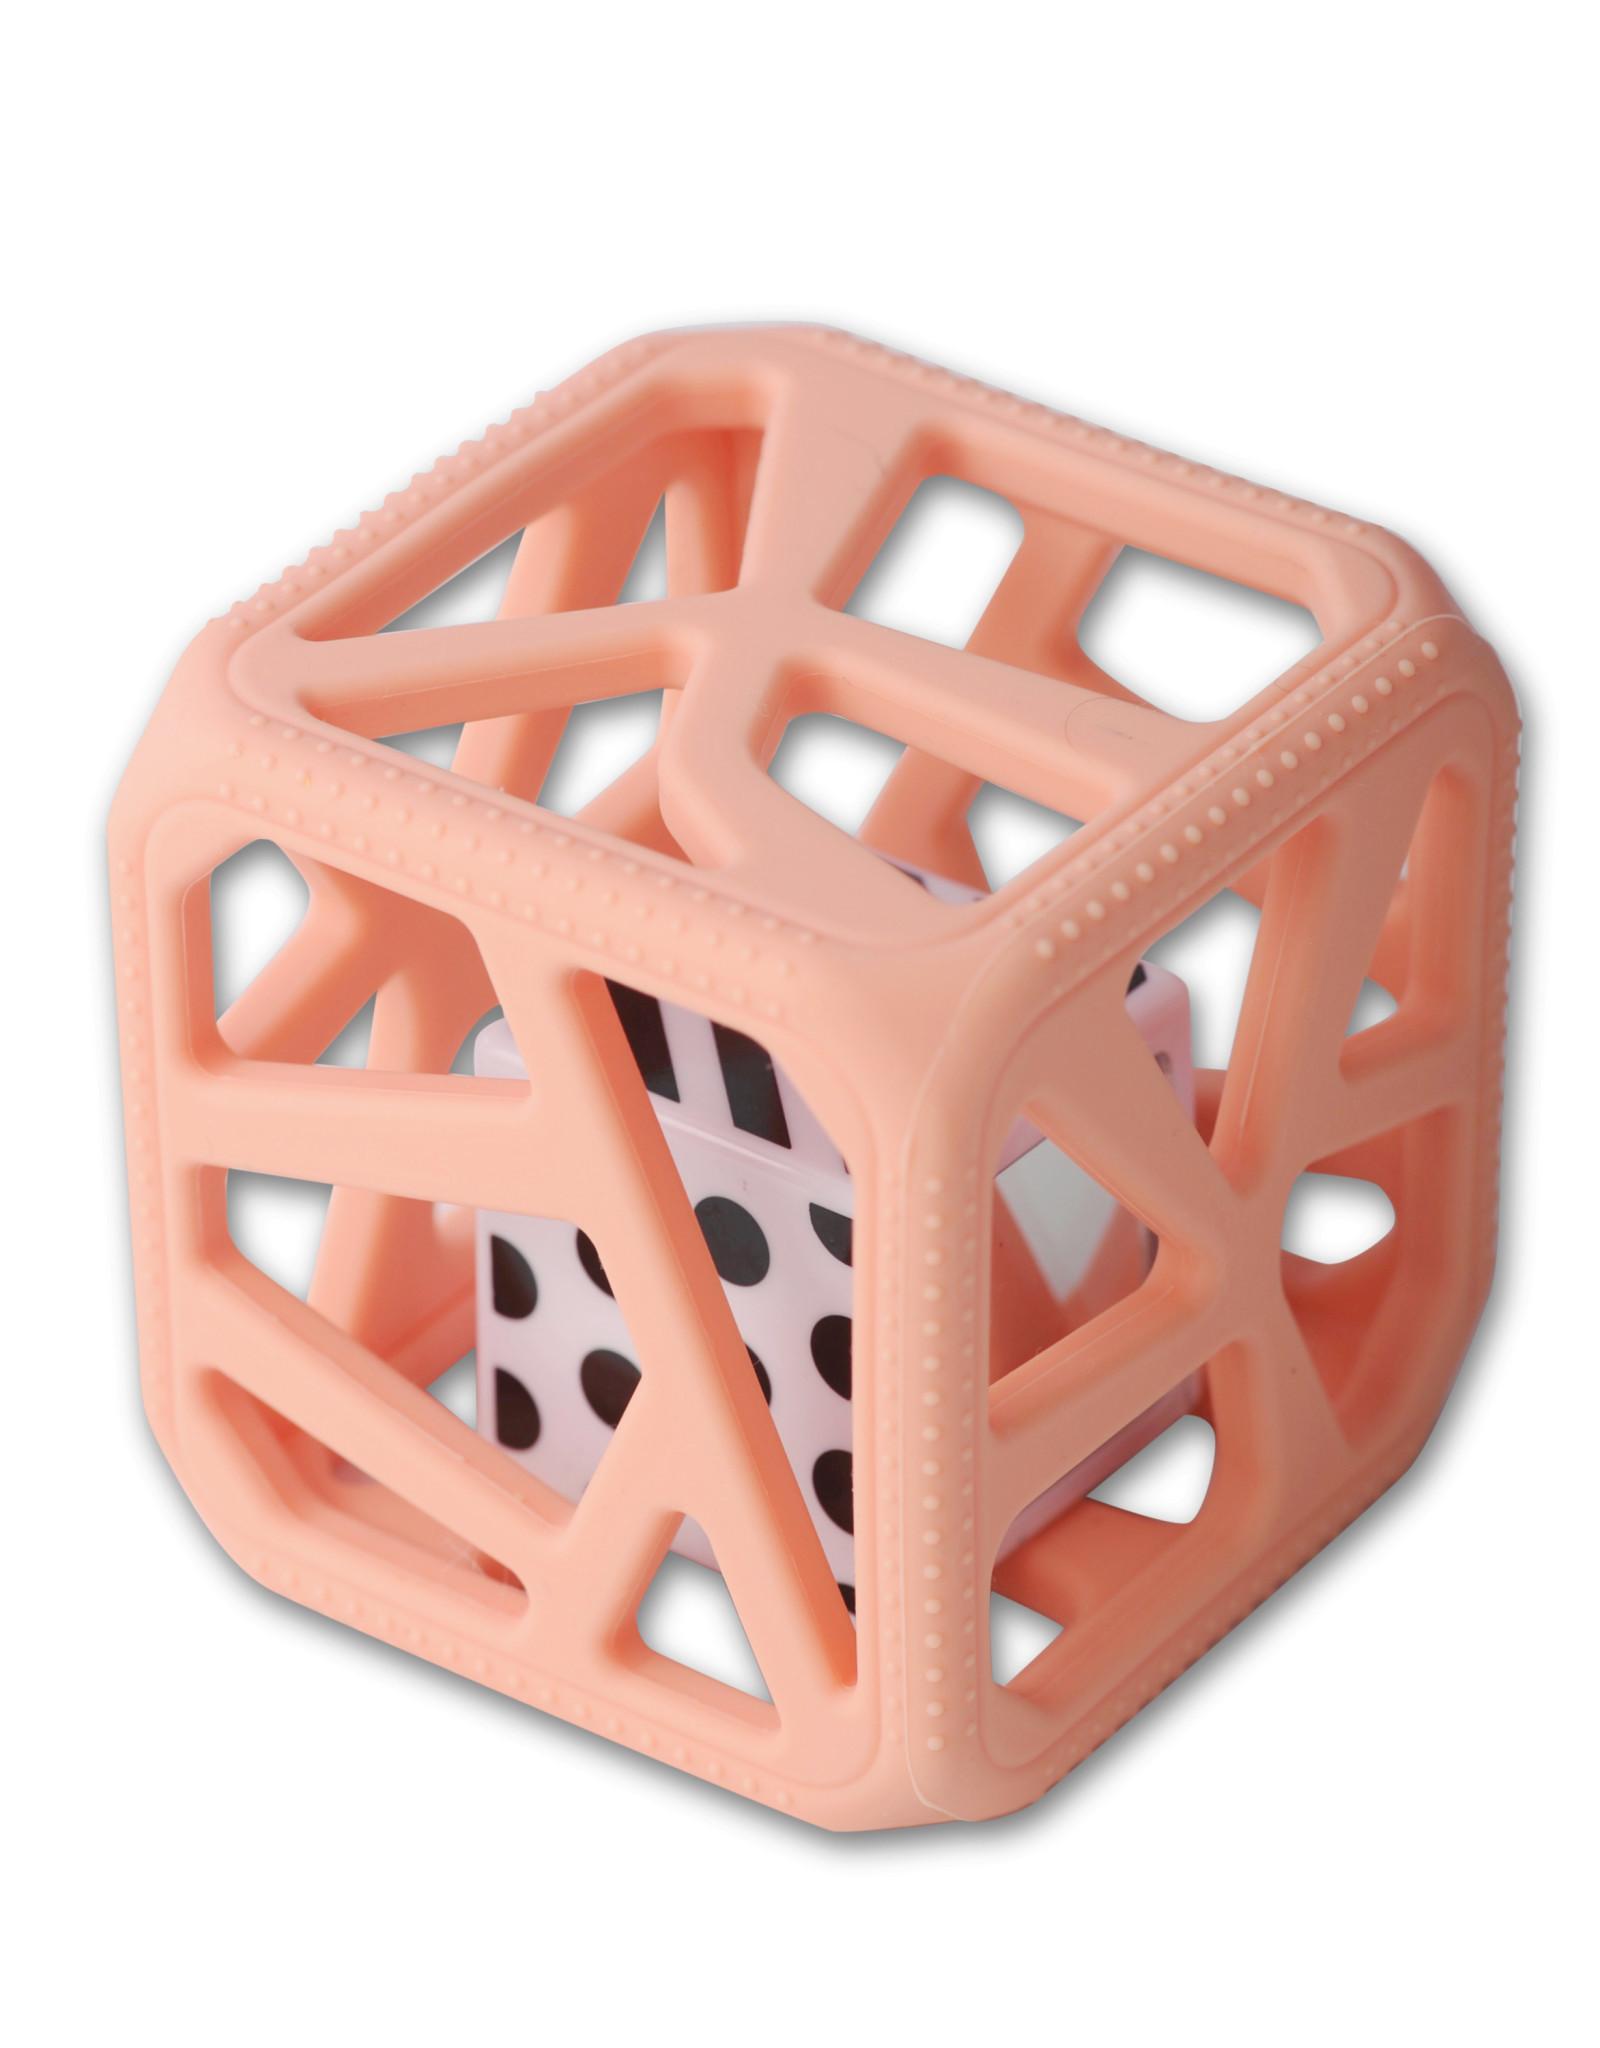 Malarkey Kids Malarkey Kids Chew Cube - Peachy Pink